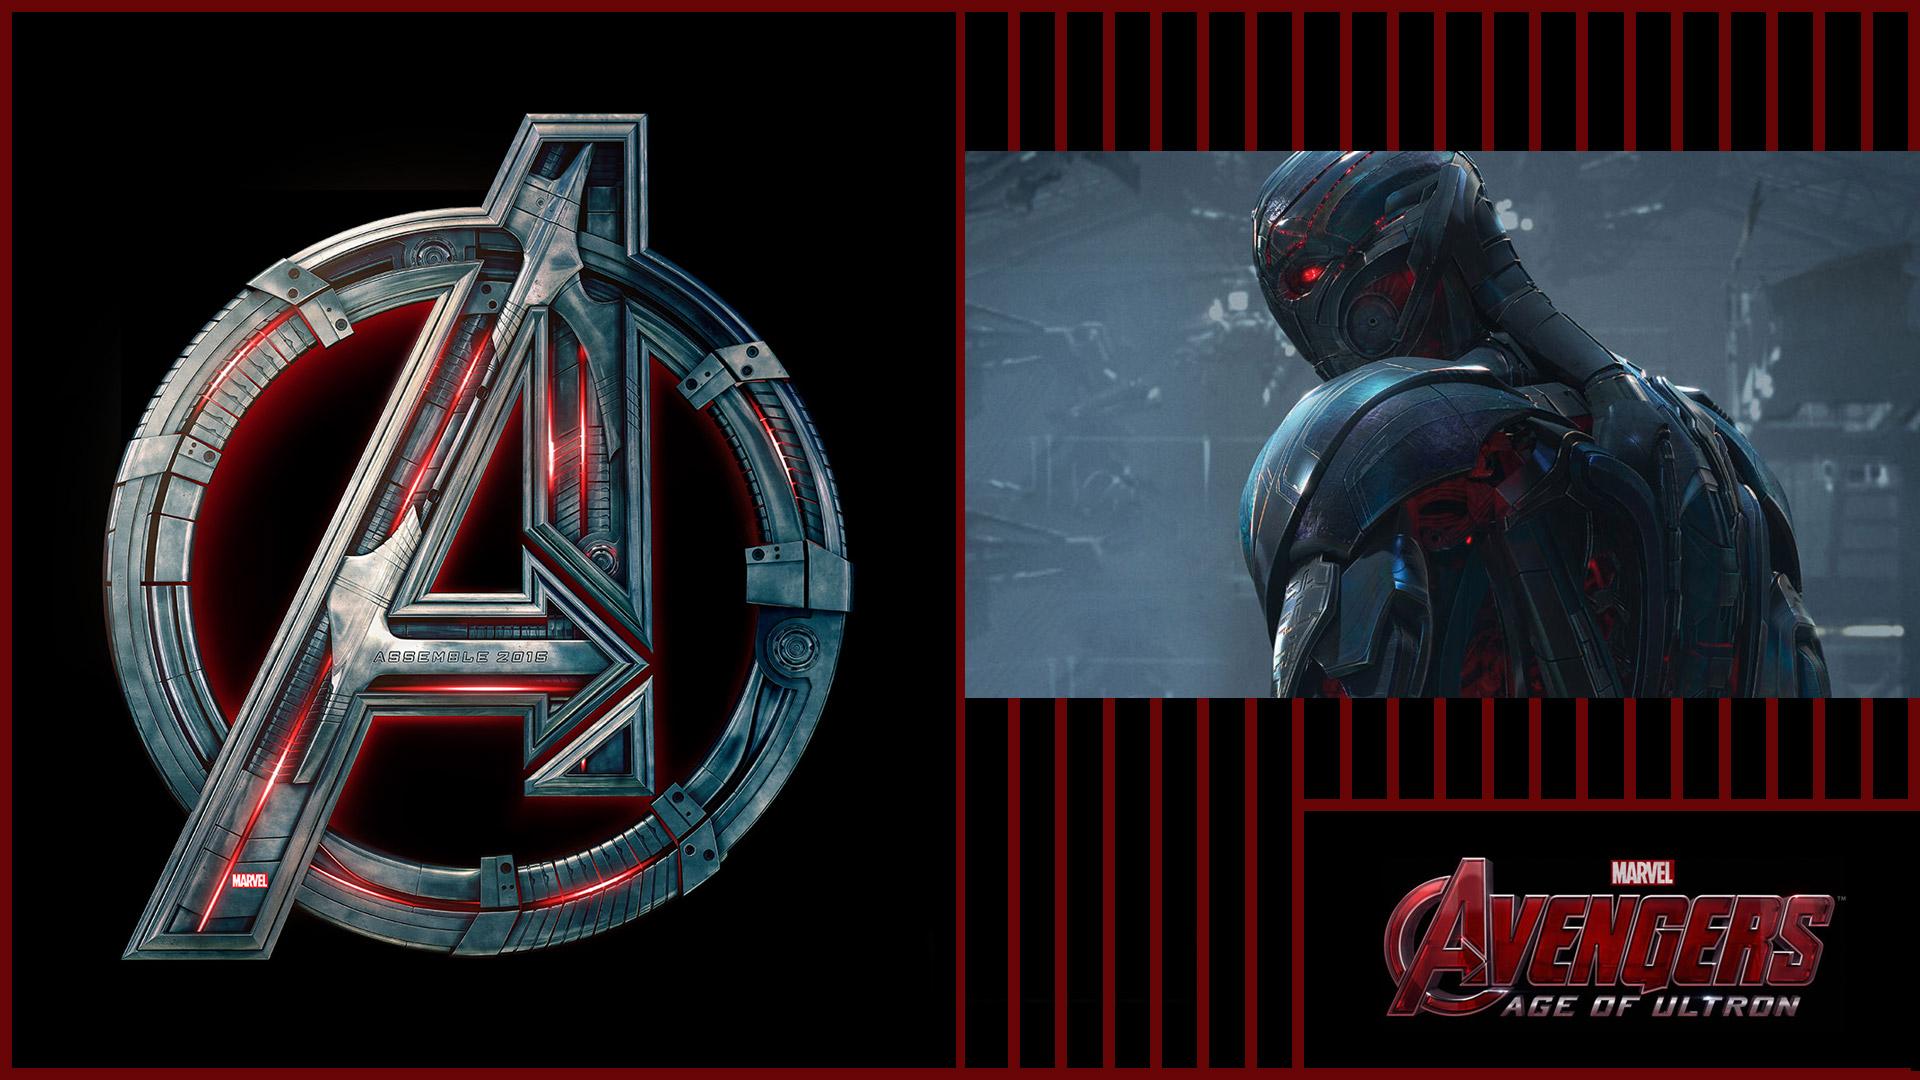 Avengers 2 Age of Ultron 2015 Desktop iPhone Wallpapers HD 1920x1080